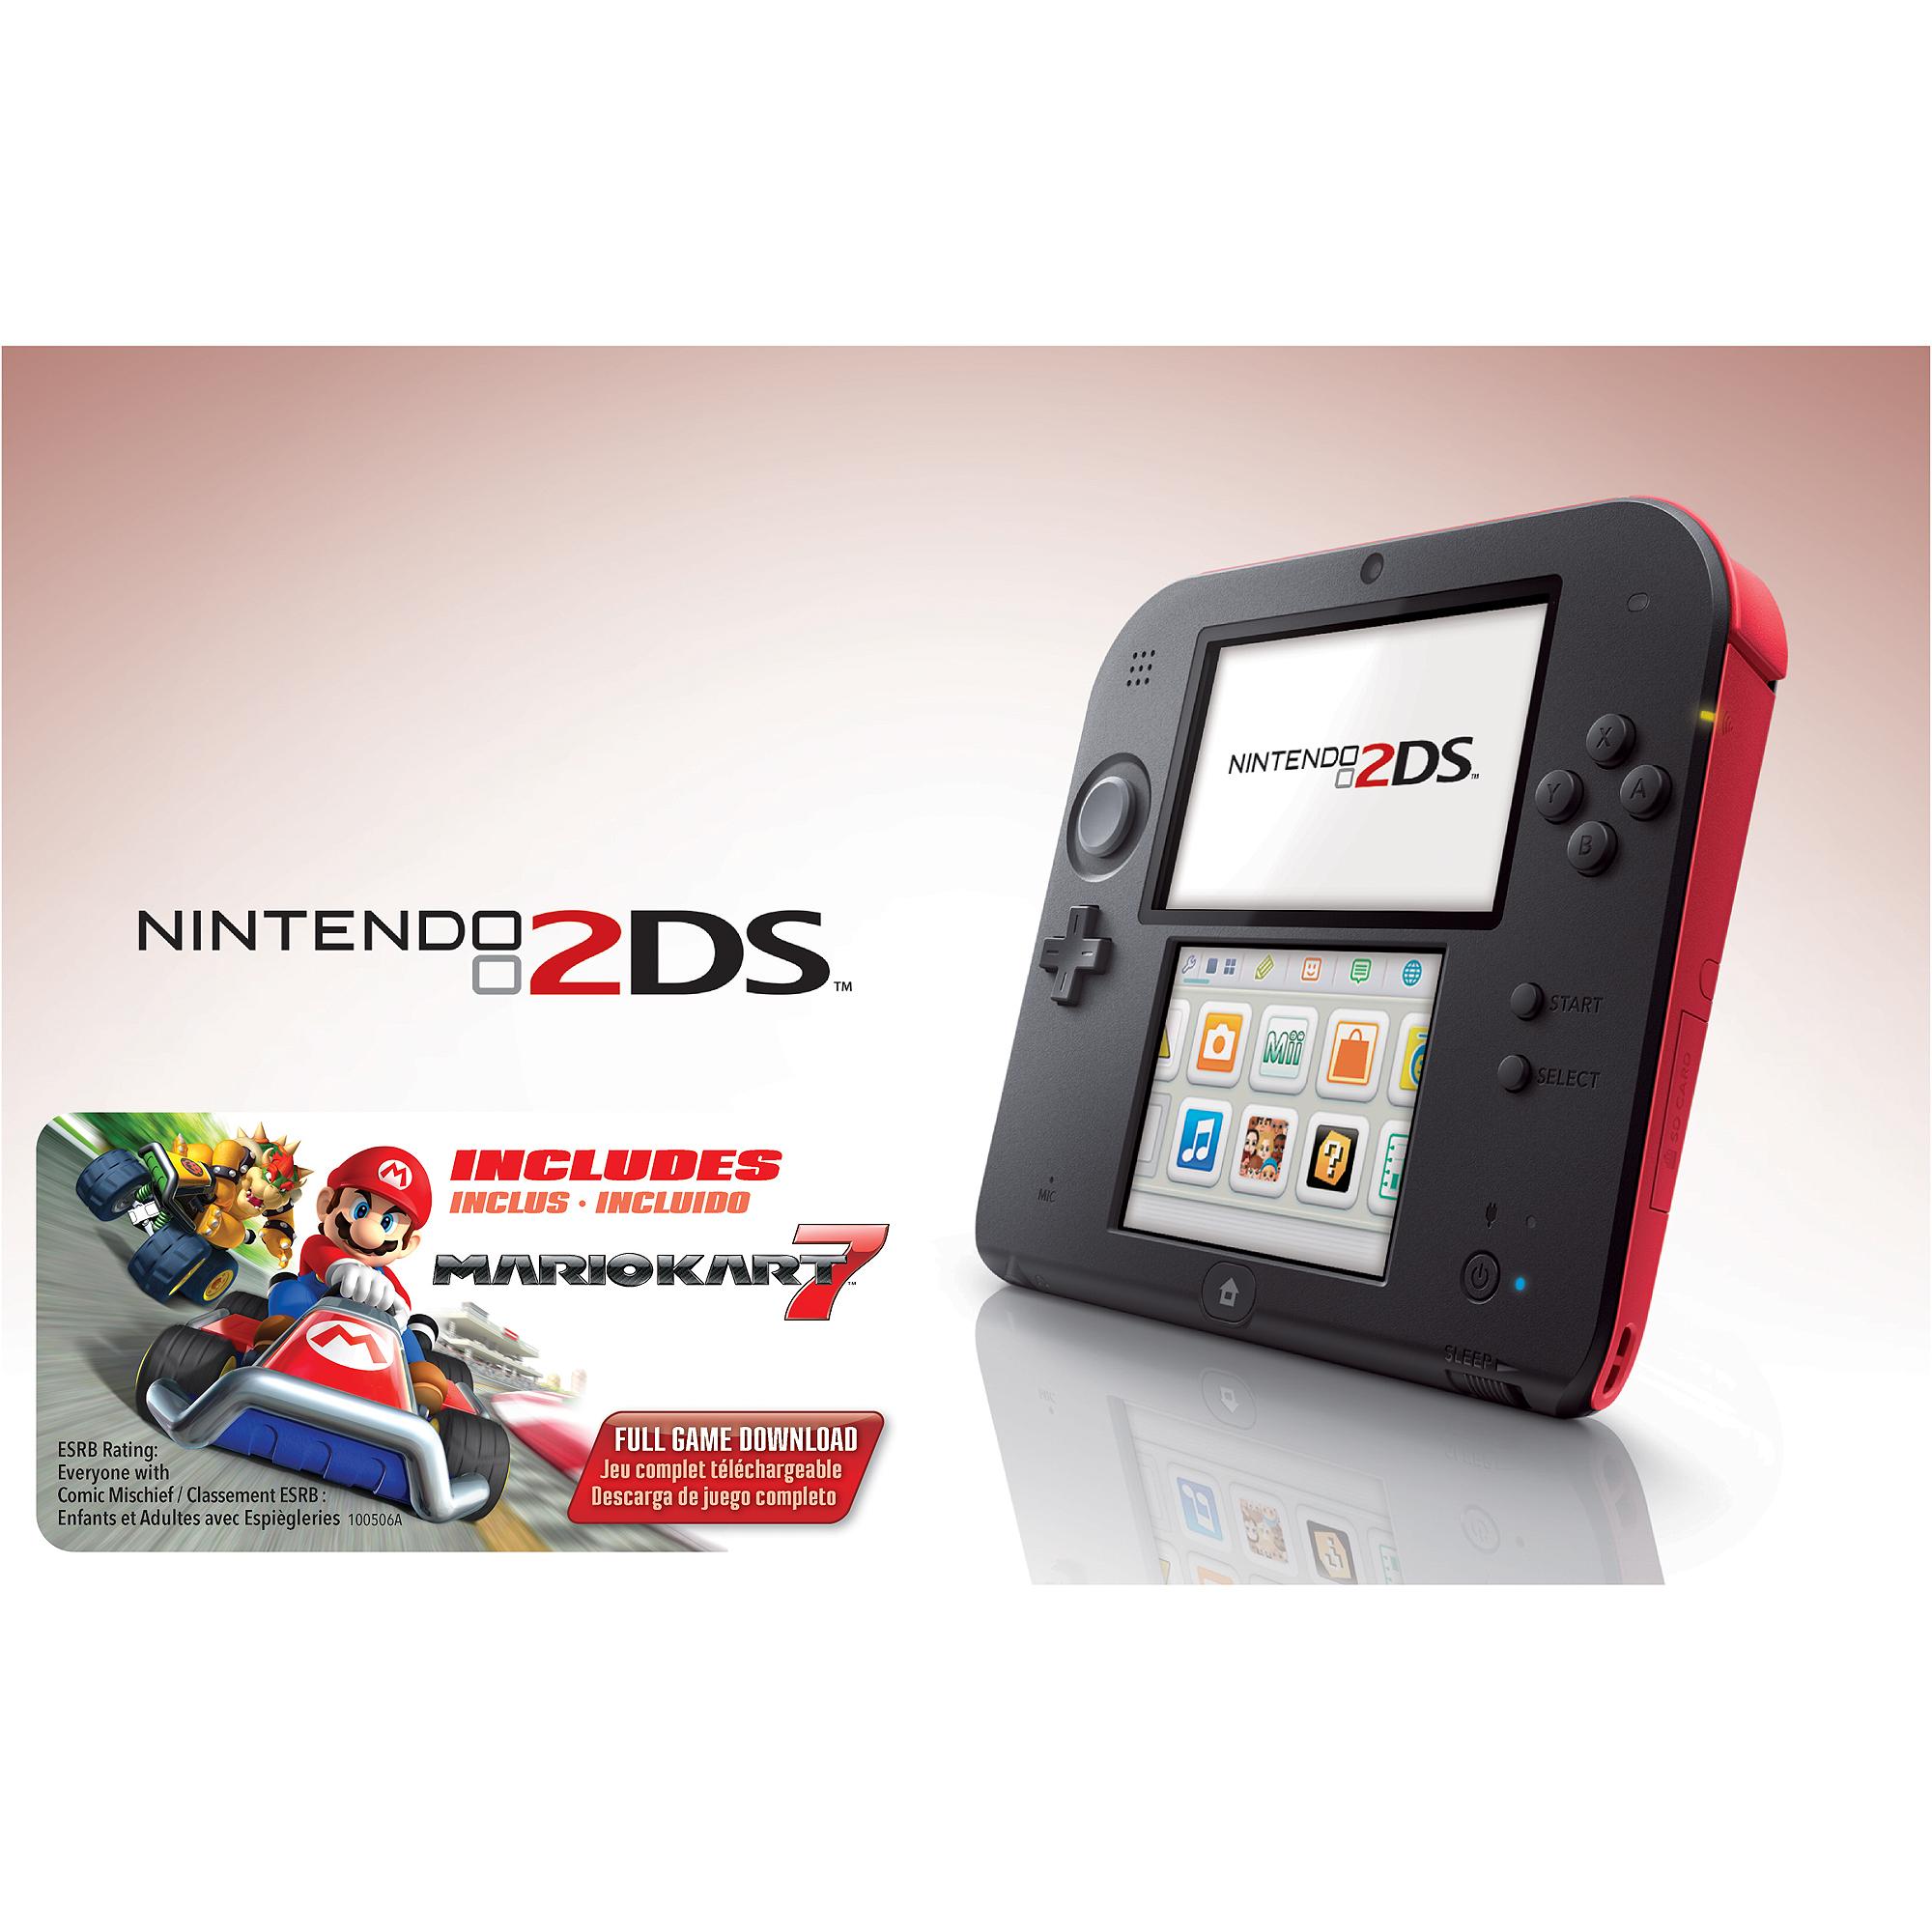 "Nintendo 2ds Handheld Game Console - 3.5"" Active Matrix Tft Color Lcd - Crimson Red - Dual Screen - 4-way - 400 X 240 - Arm - 128 Mb Memory - 6 Mb Digital Media Professionals Pica200 - (2dsftrsrm11)"